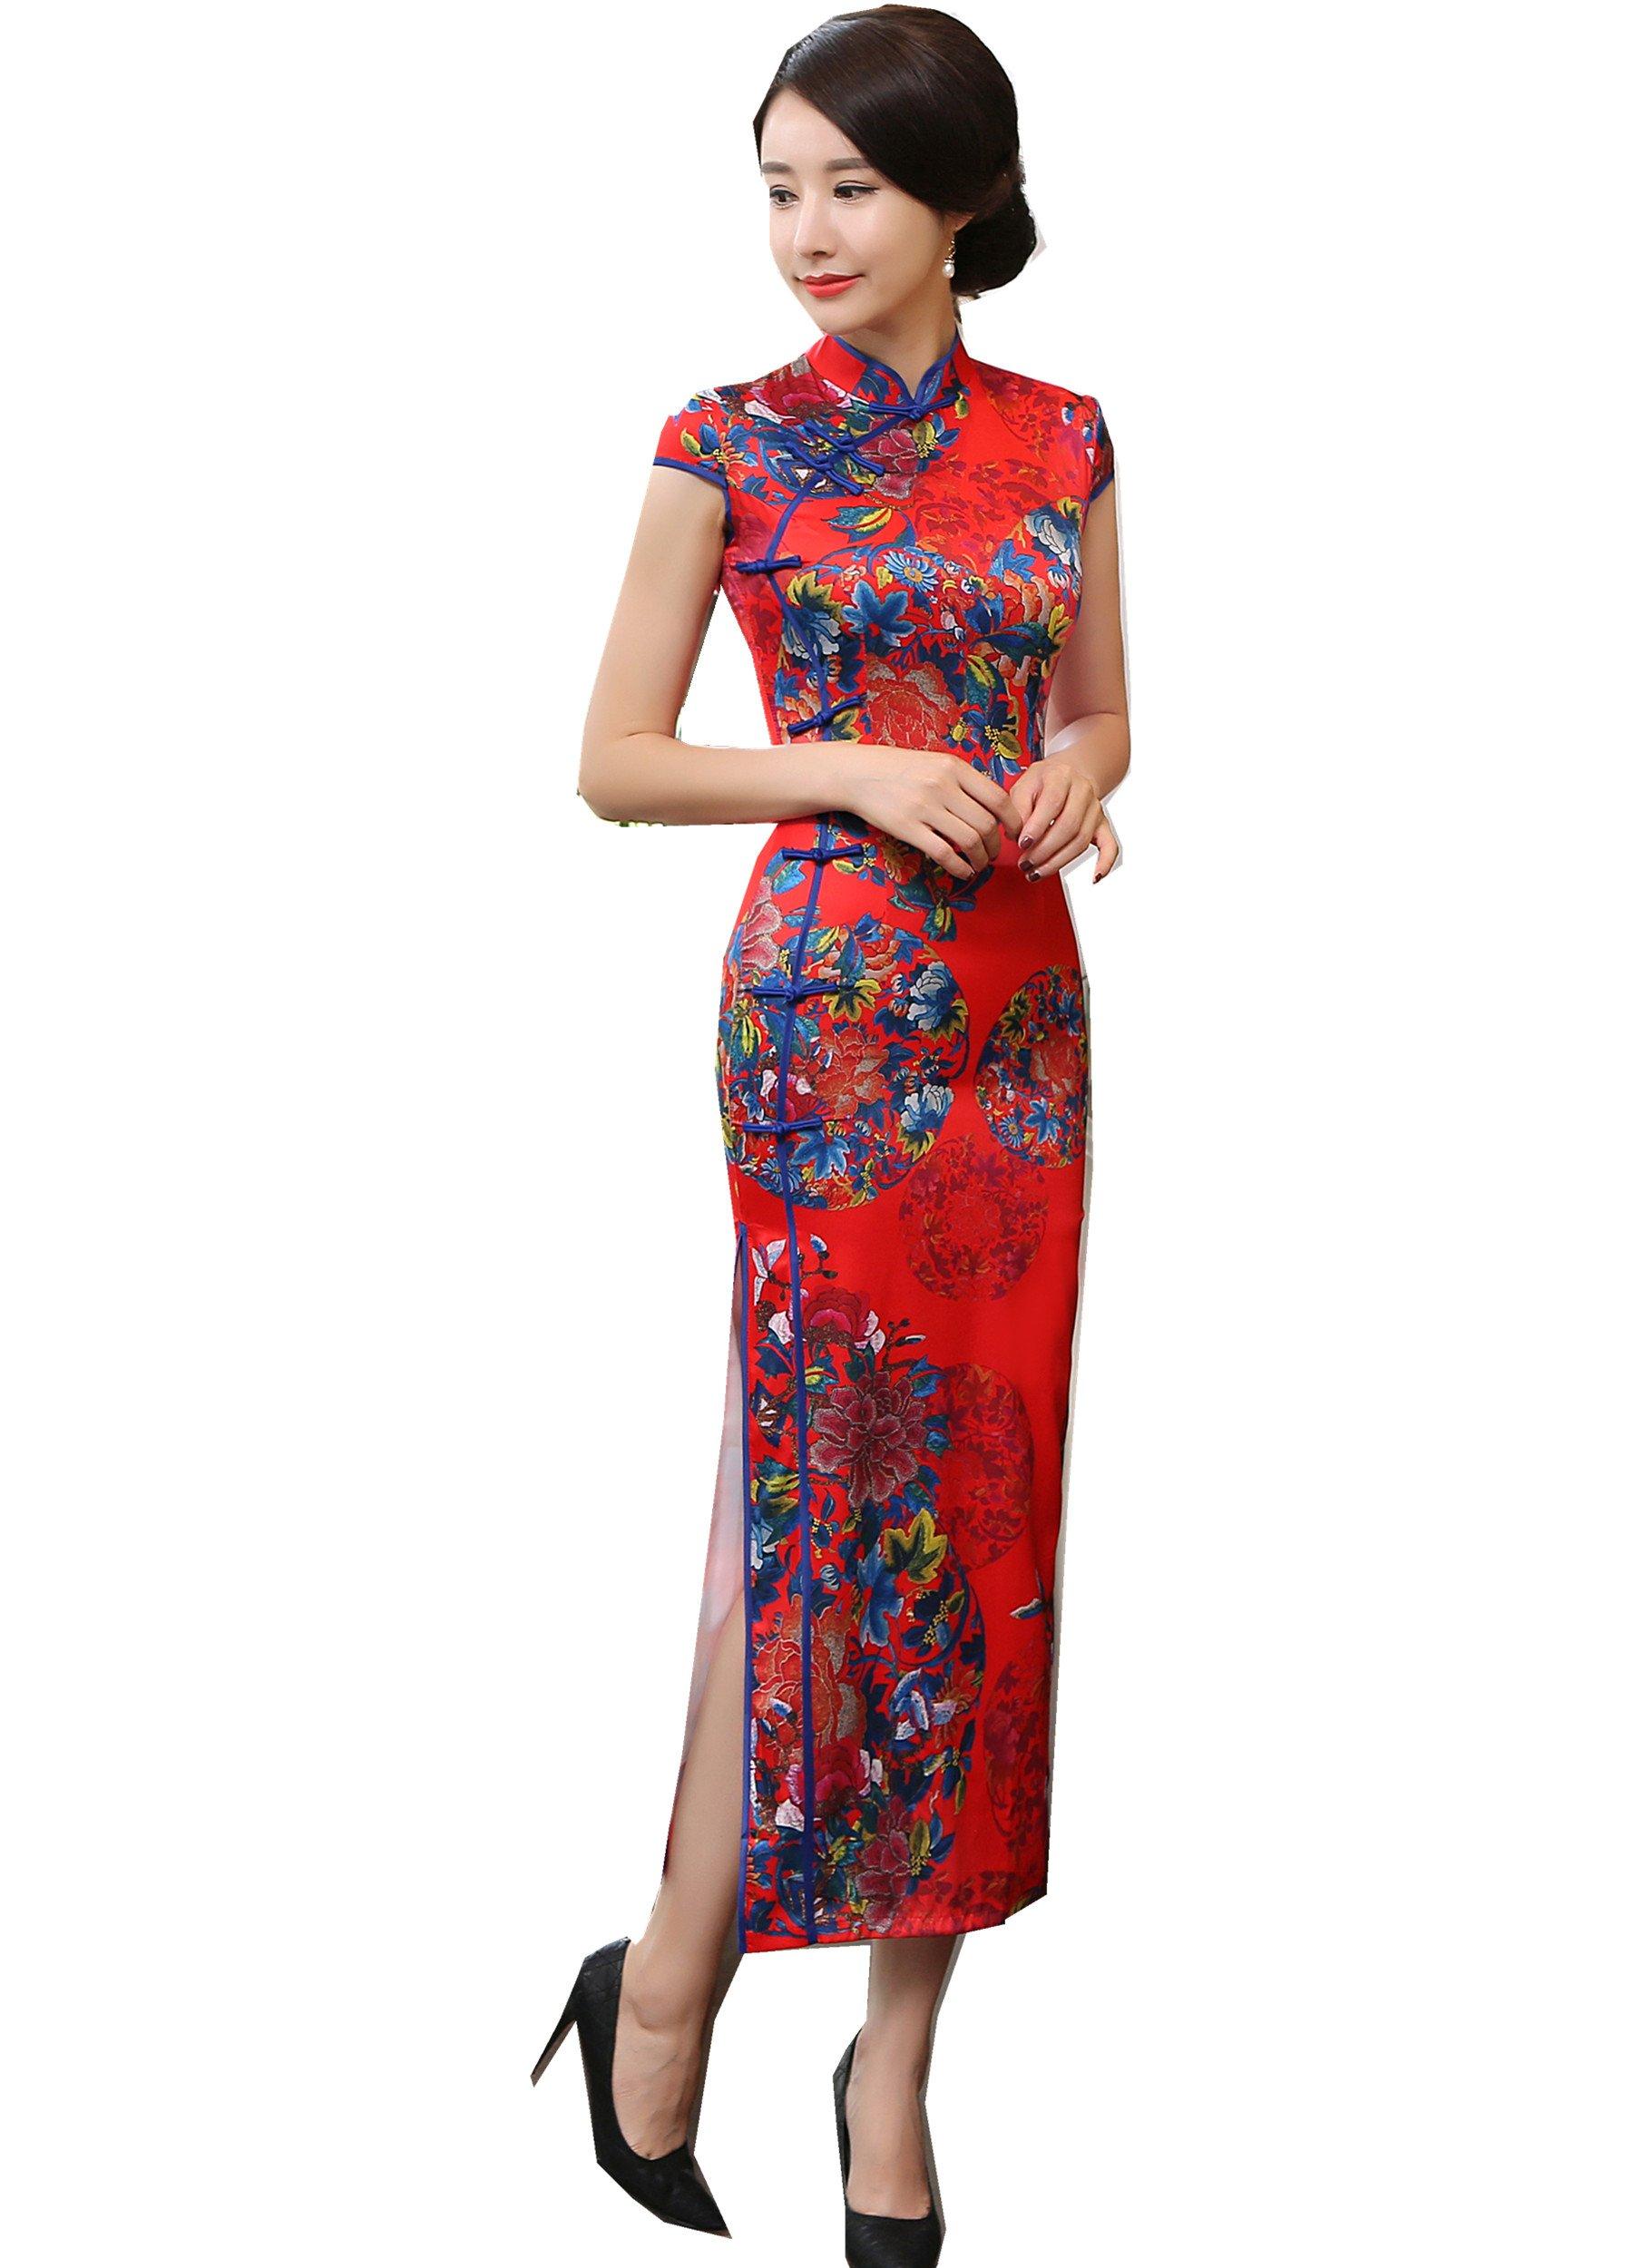 Shanghai Story Short Long China Qipao Chinese Traditional Dress Cheongsam 2 153